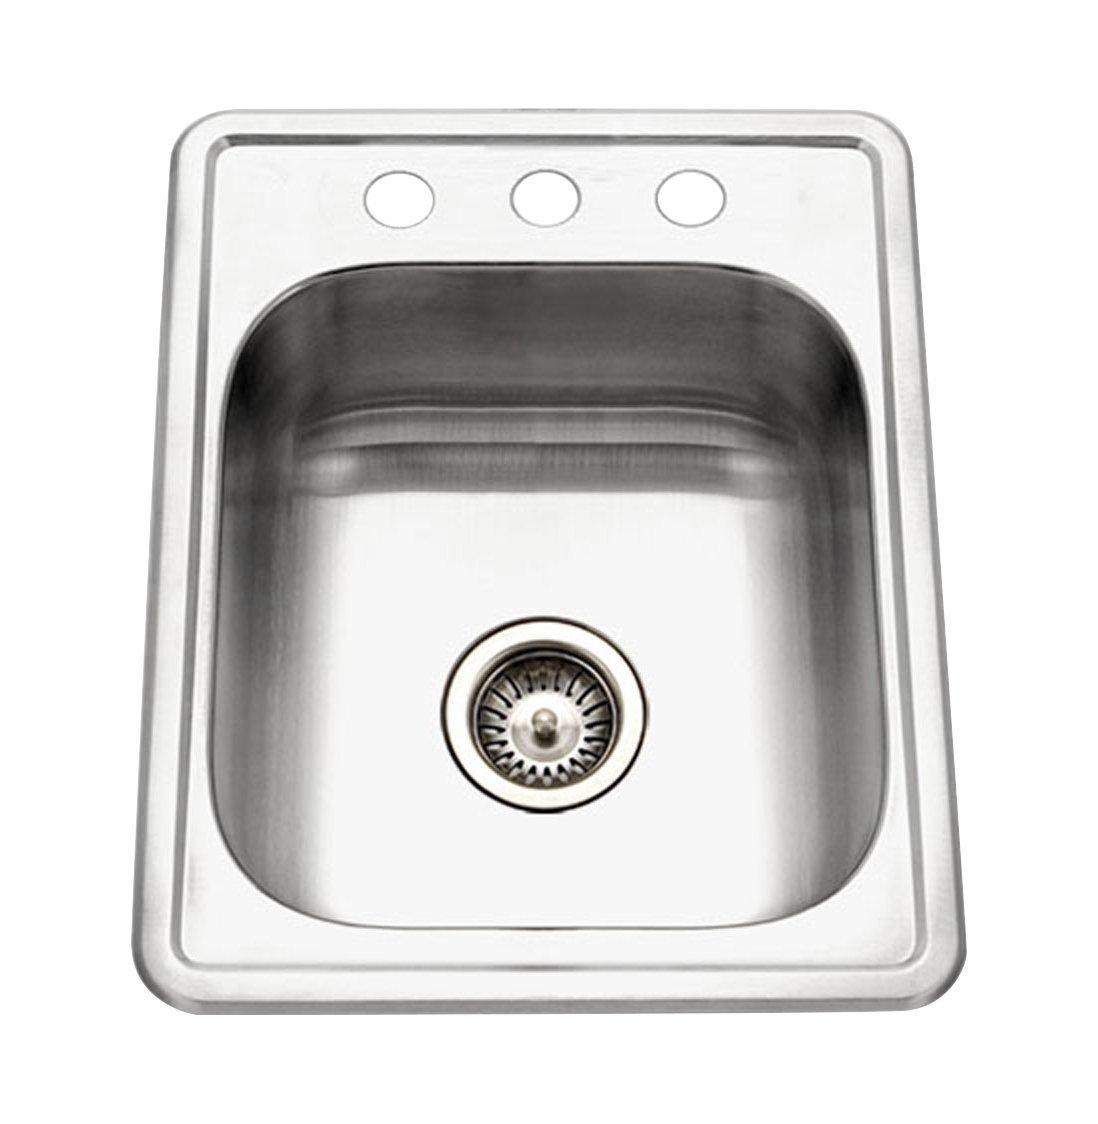 Houzer A1722-7BS-1 ADA Glowtone Topmount Stainless Steel 17'' x 22'' Sink with 3 Holes (Renewed)